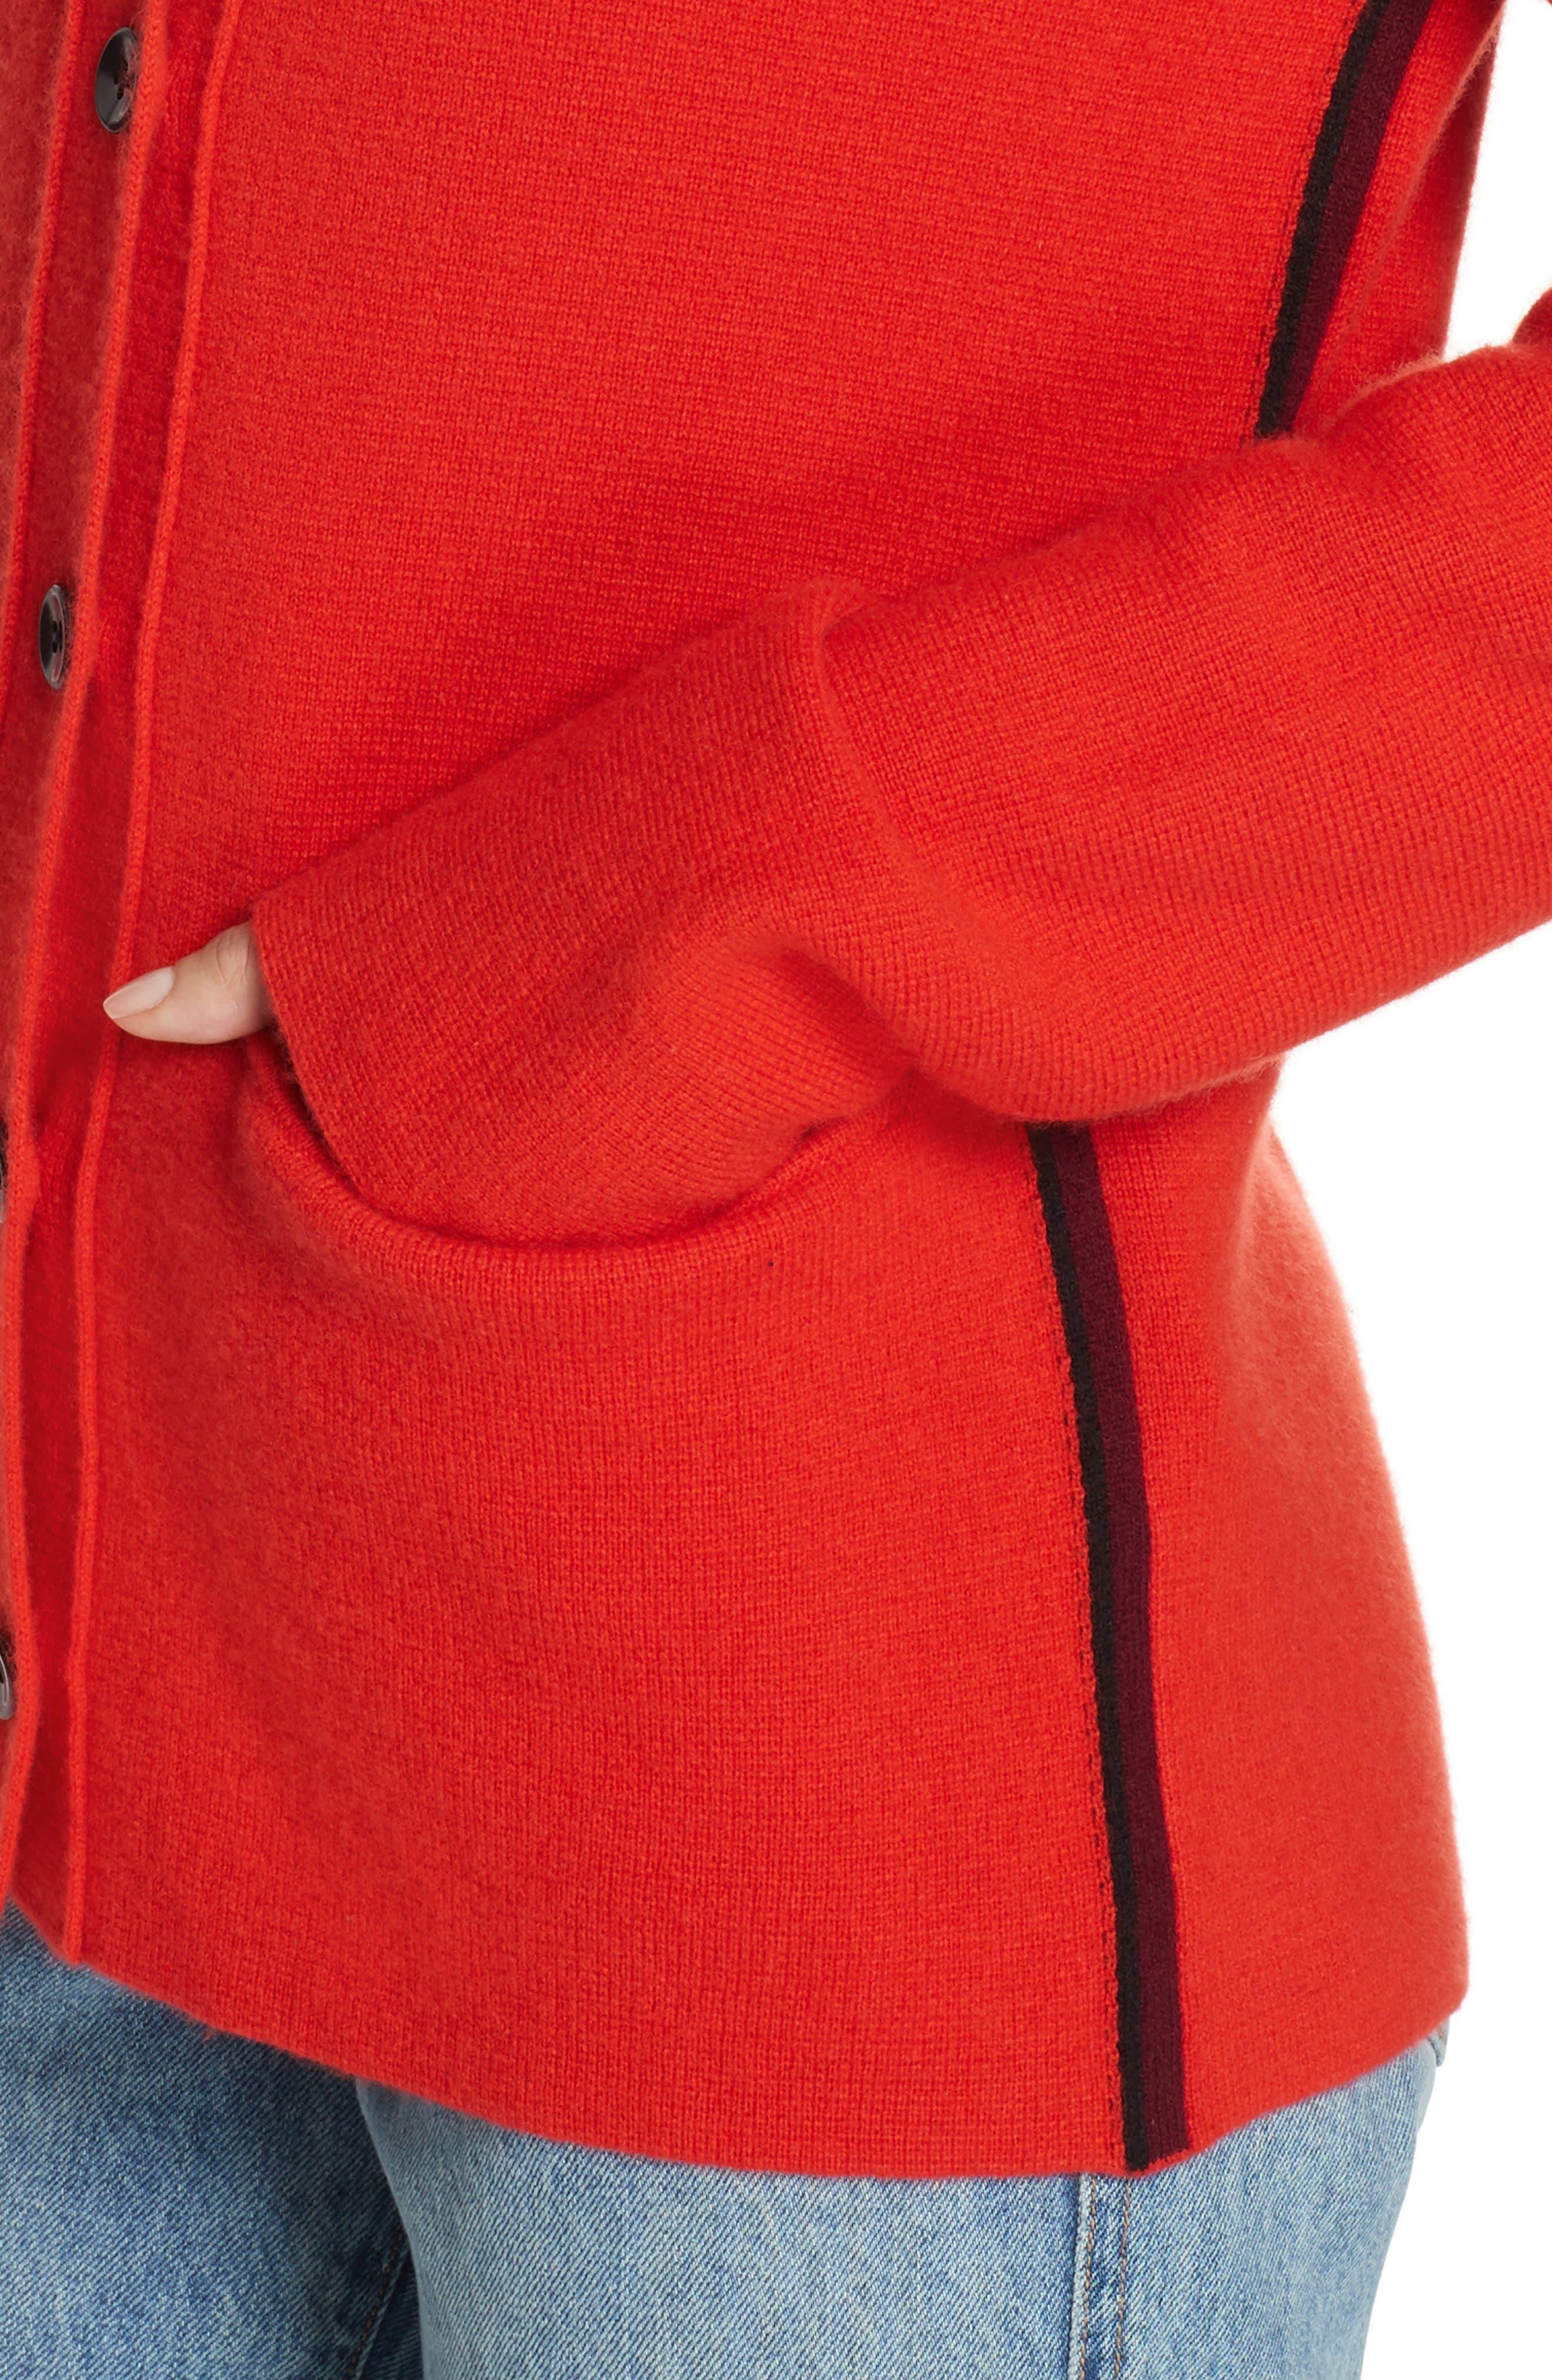 PSWL Stripe Sleeve Merino Wool & Cashmere Cardigan,                             Alternate thumbnail 4, color,                             RED COMBO